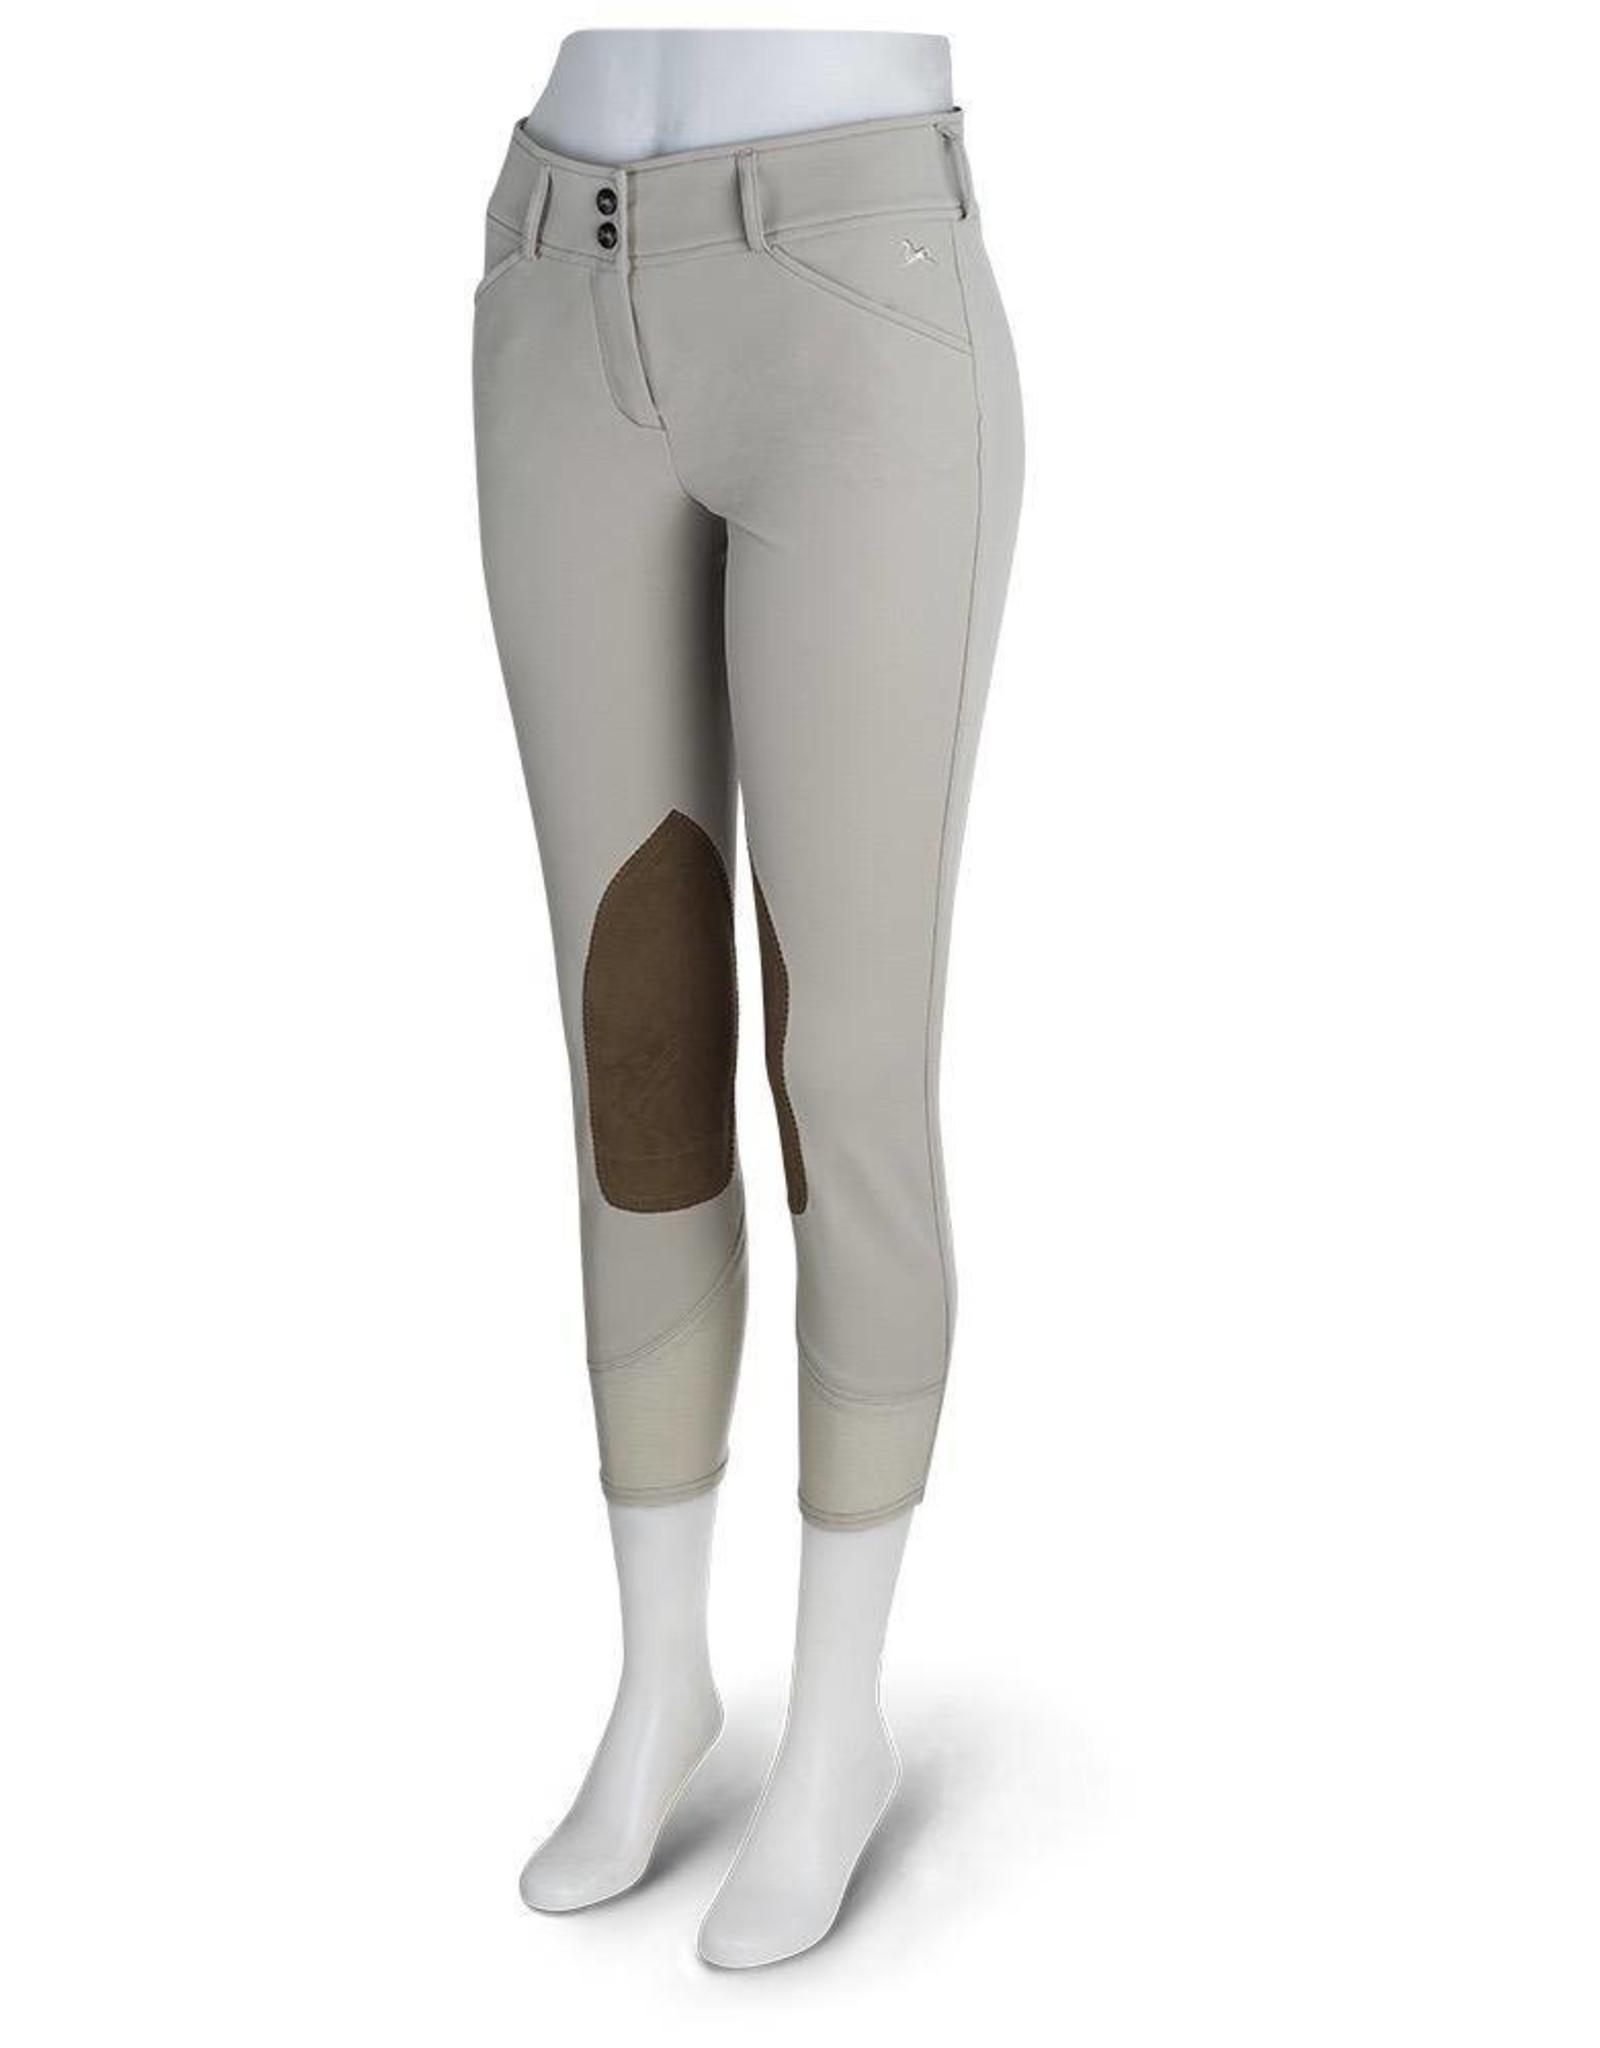 RJ Classics Ladies' Gulf Knee Patch Breeches